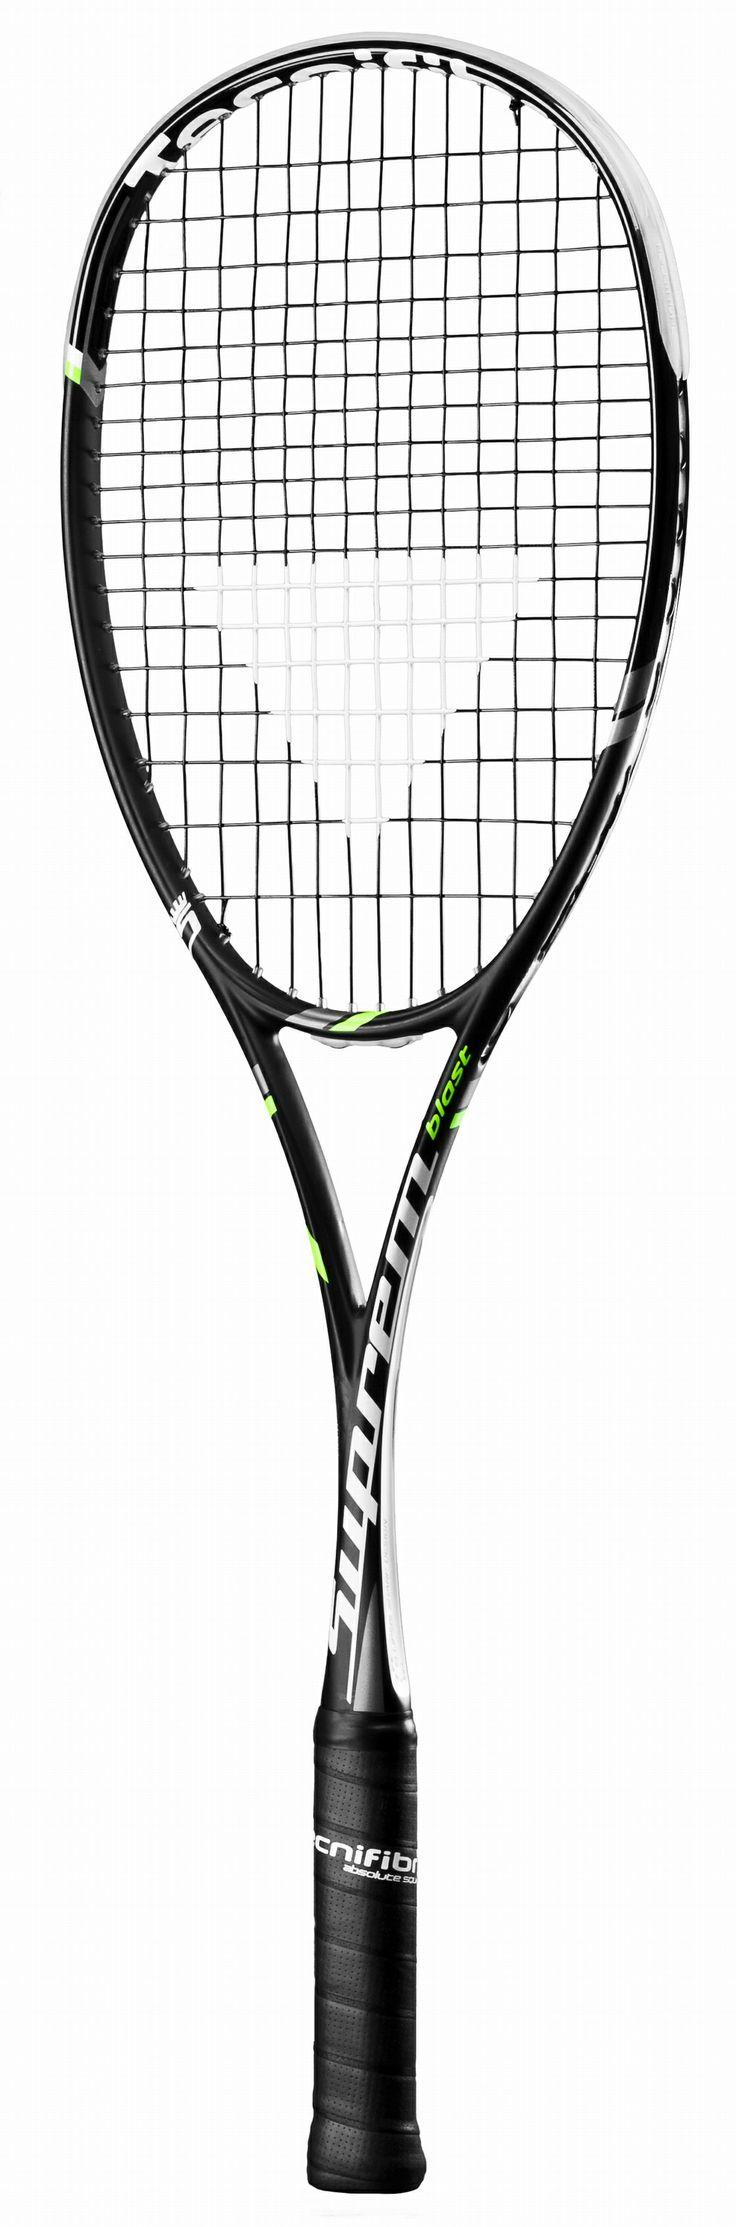 *NEW 2014!* Tecnifibre Suprem Blast Squash Racket £59.99 - Squash - Squash Rackets Squash and Racketball Specialist Online Store - HitTheNick.com